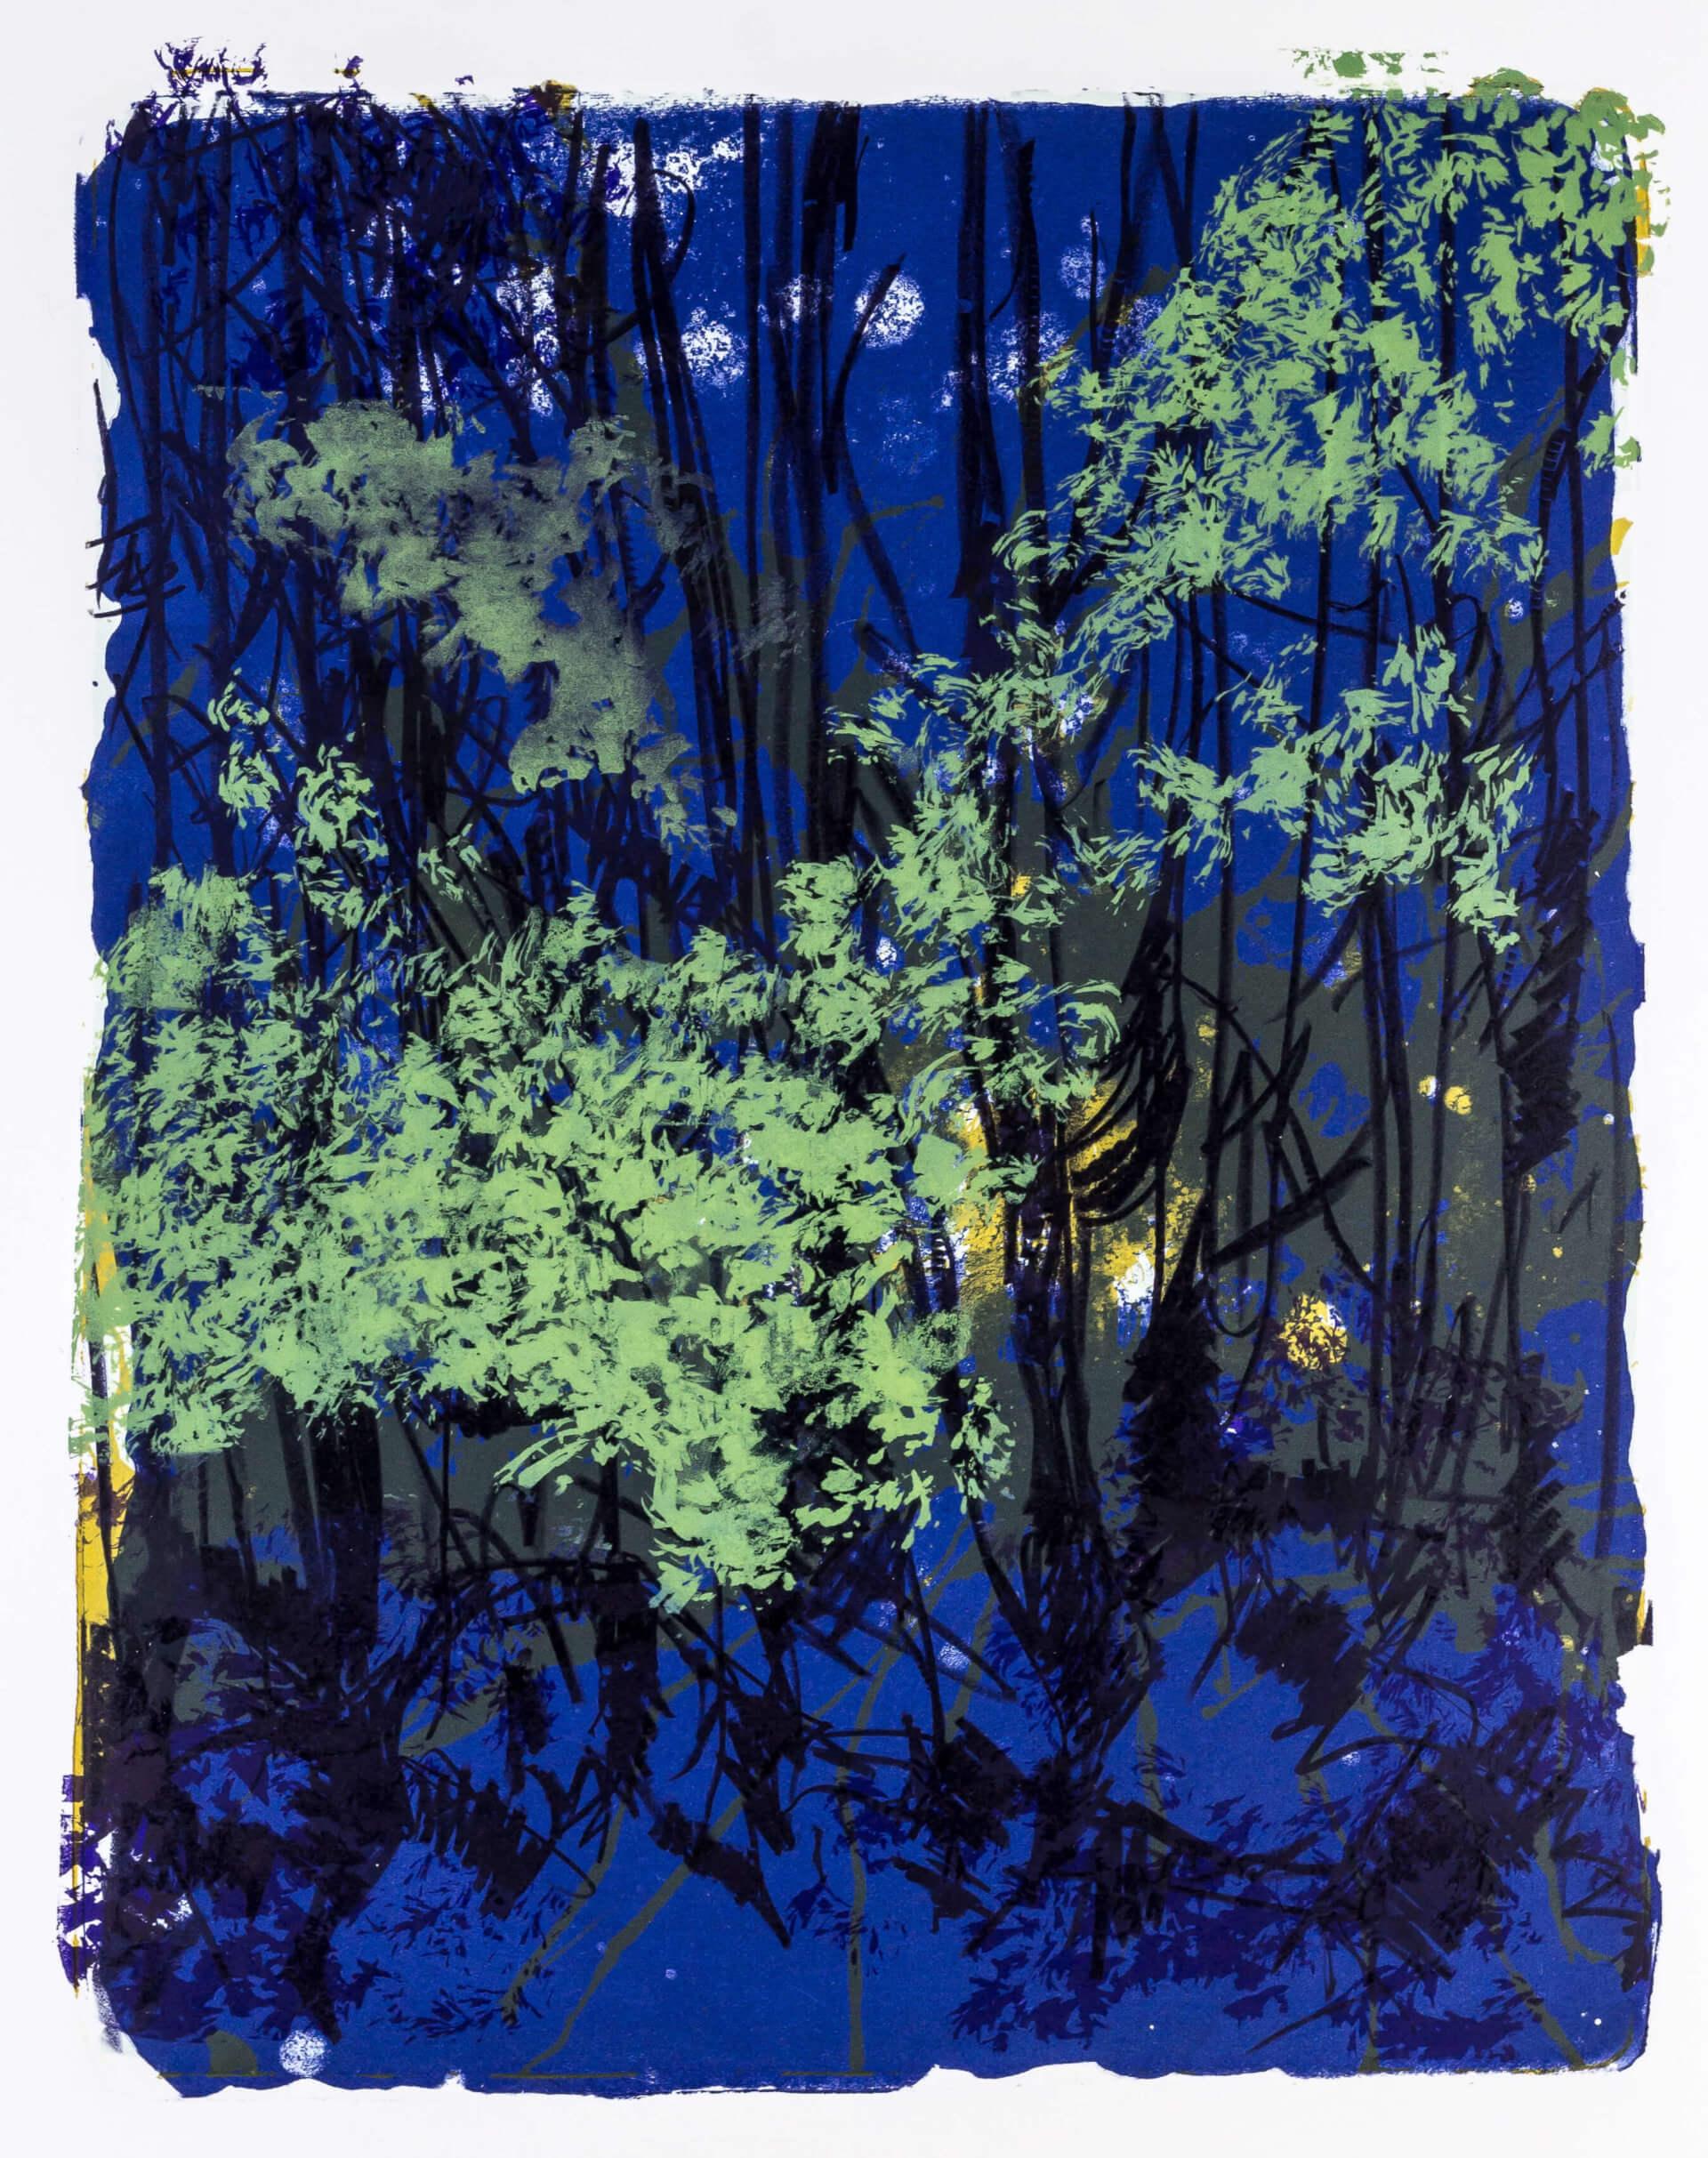 Katharina Albers, Wald X-XVIII, 2015, Farblithographie, Unikat, 50×40 cm